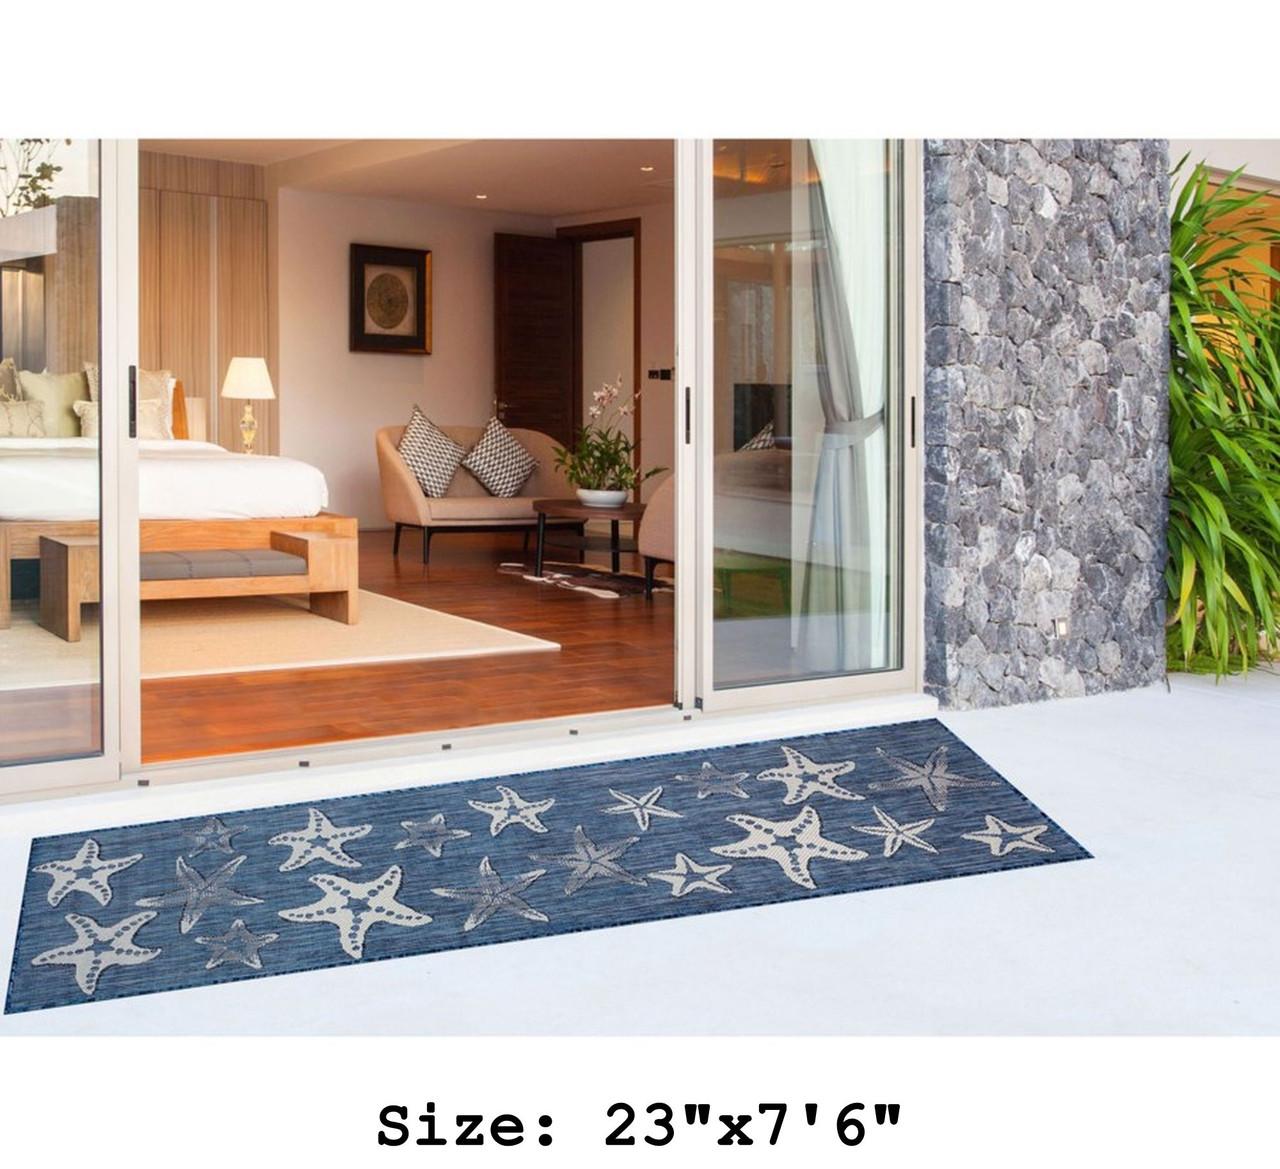 Navy Carmel Starfish Indoor/Outdoor Rug - Runner Lifestyle